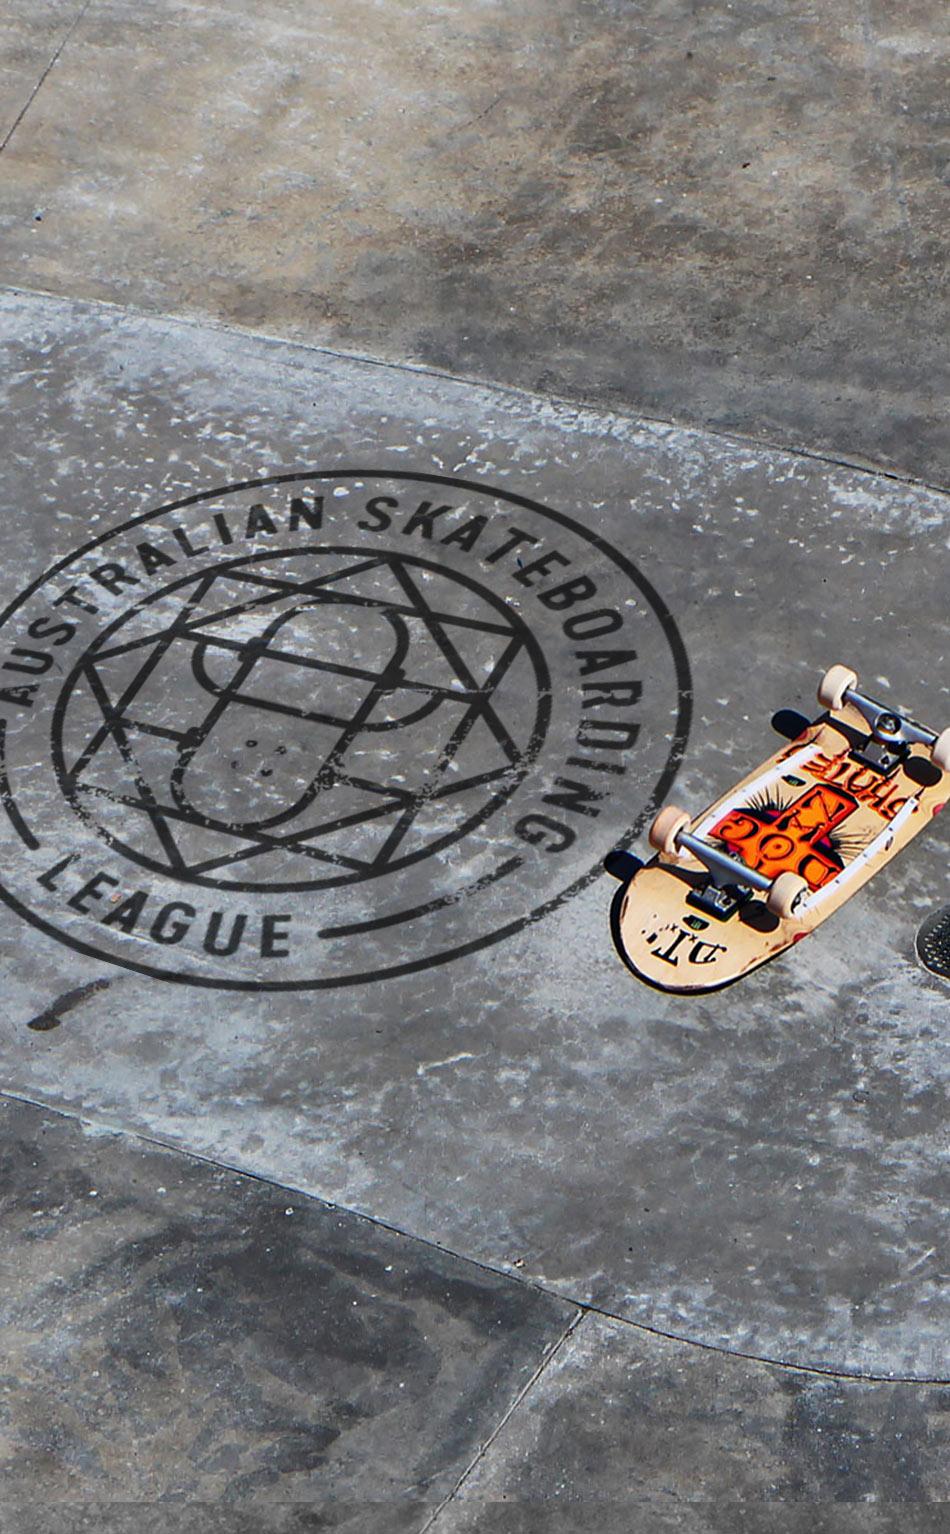 Australian Skateboarrding League logo Graphic design melbourne, branding design melbourne, branding design, packaging design melbourne, design studio melbourne, graphic design